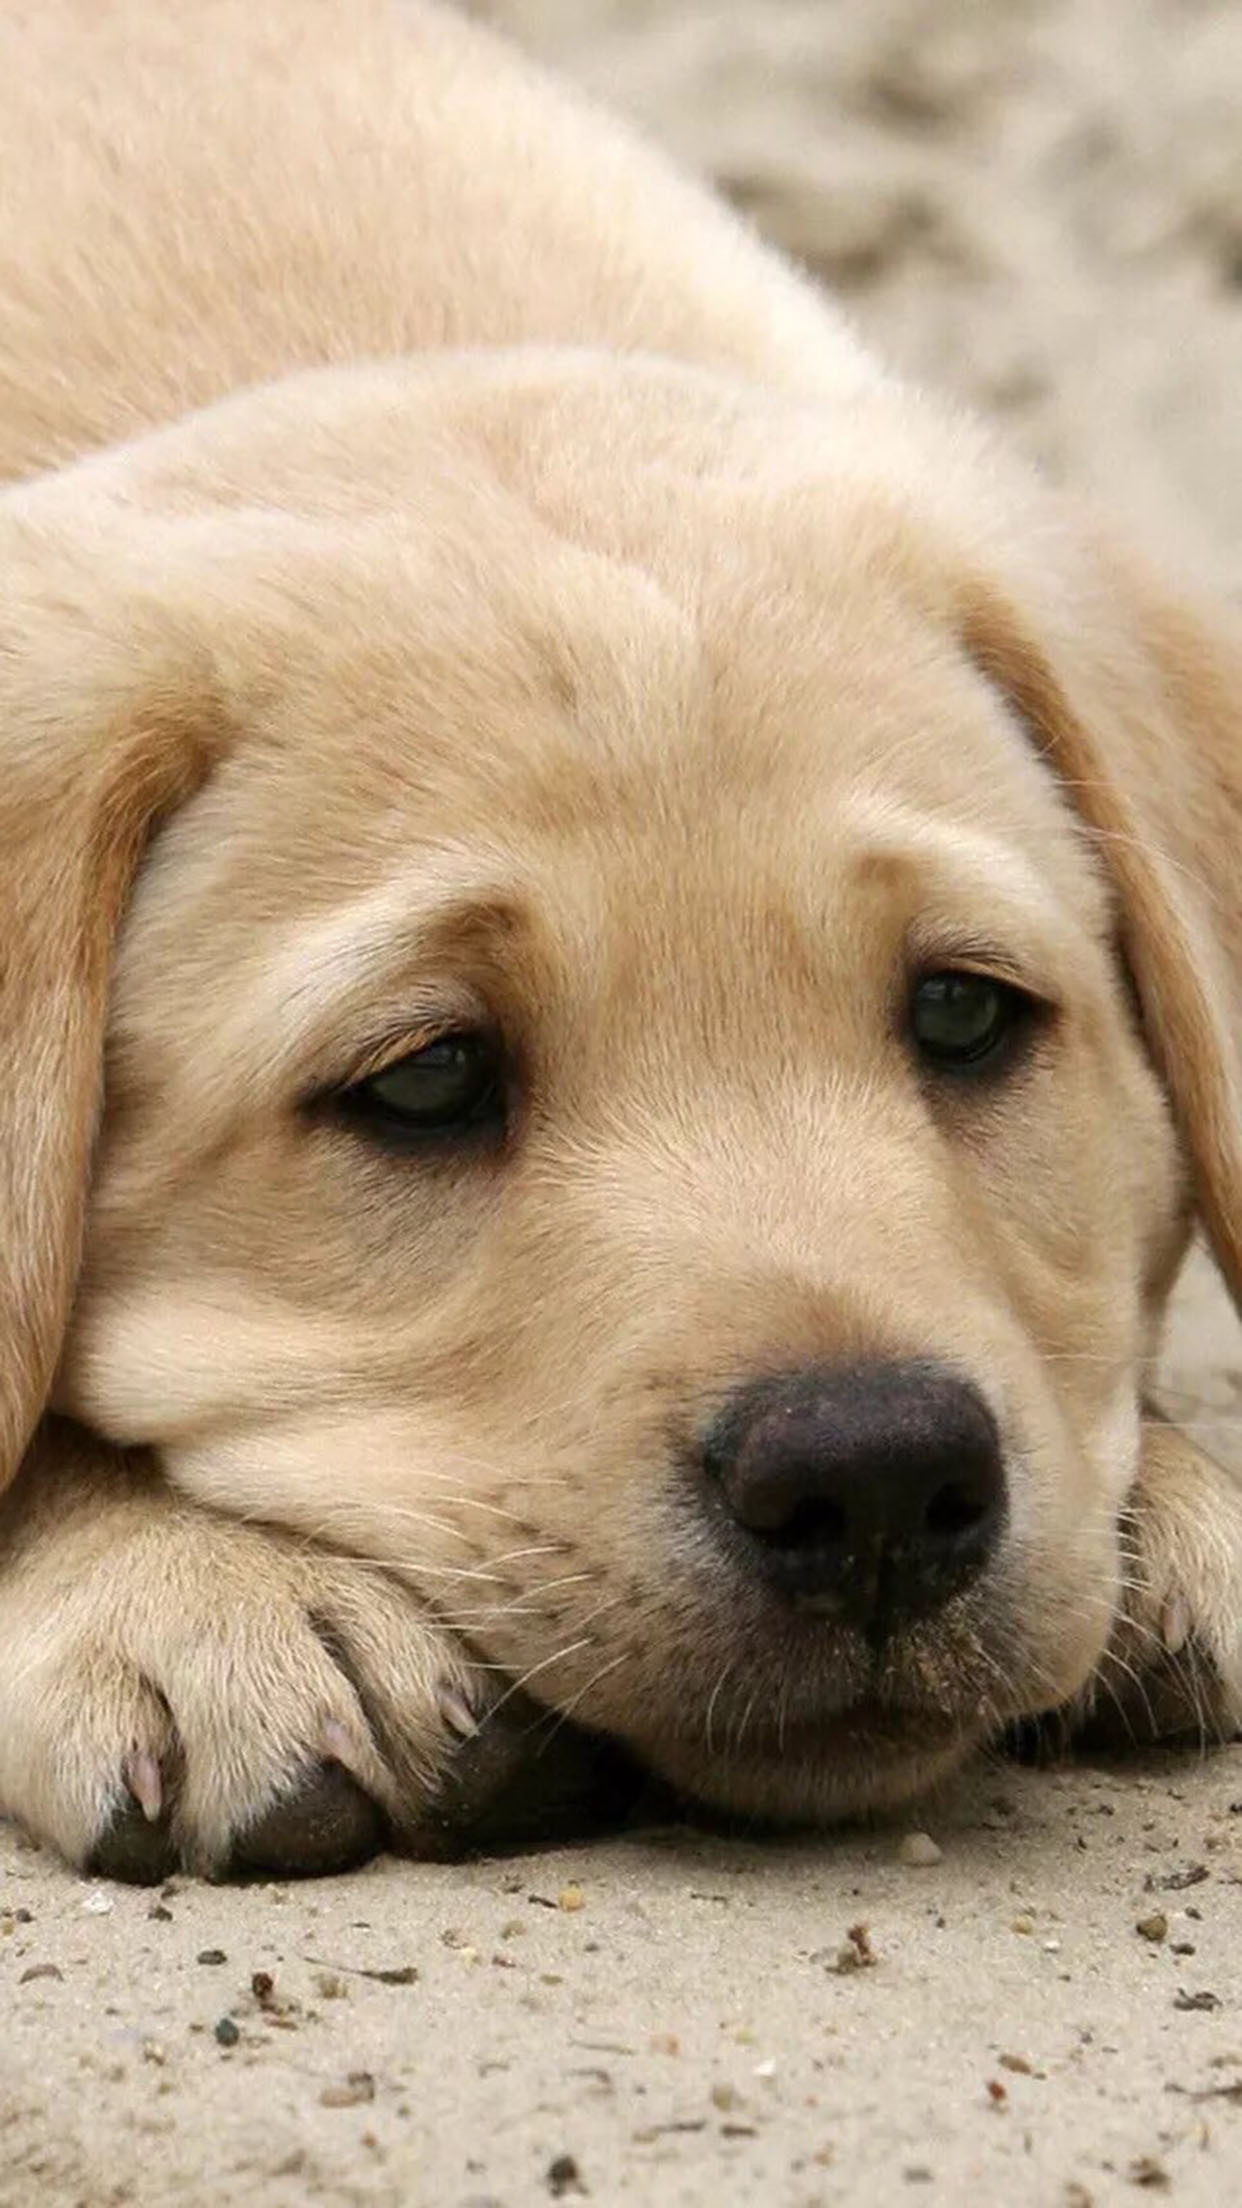 Dog Dog 2 3Wallpapers iPhone Parallax Dog 2